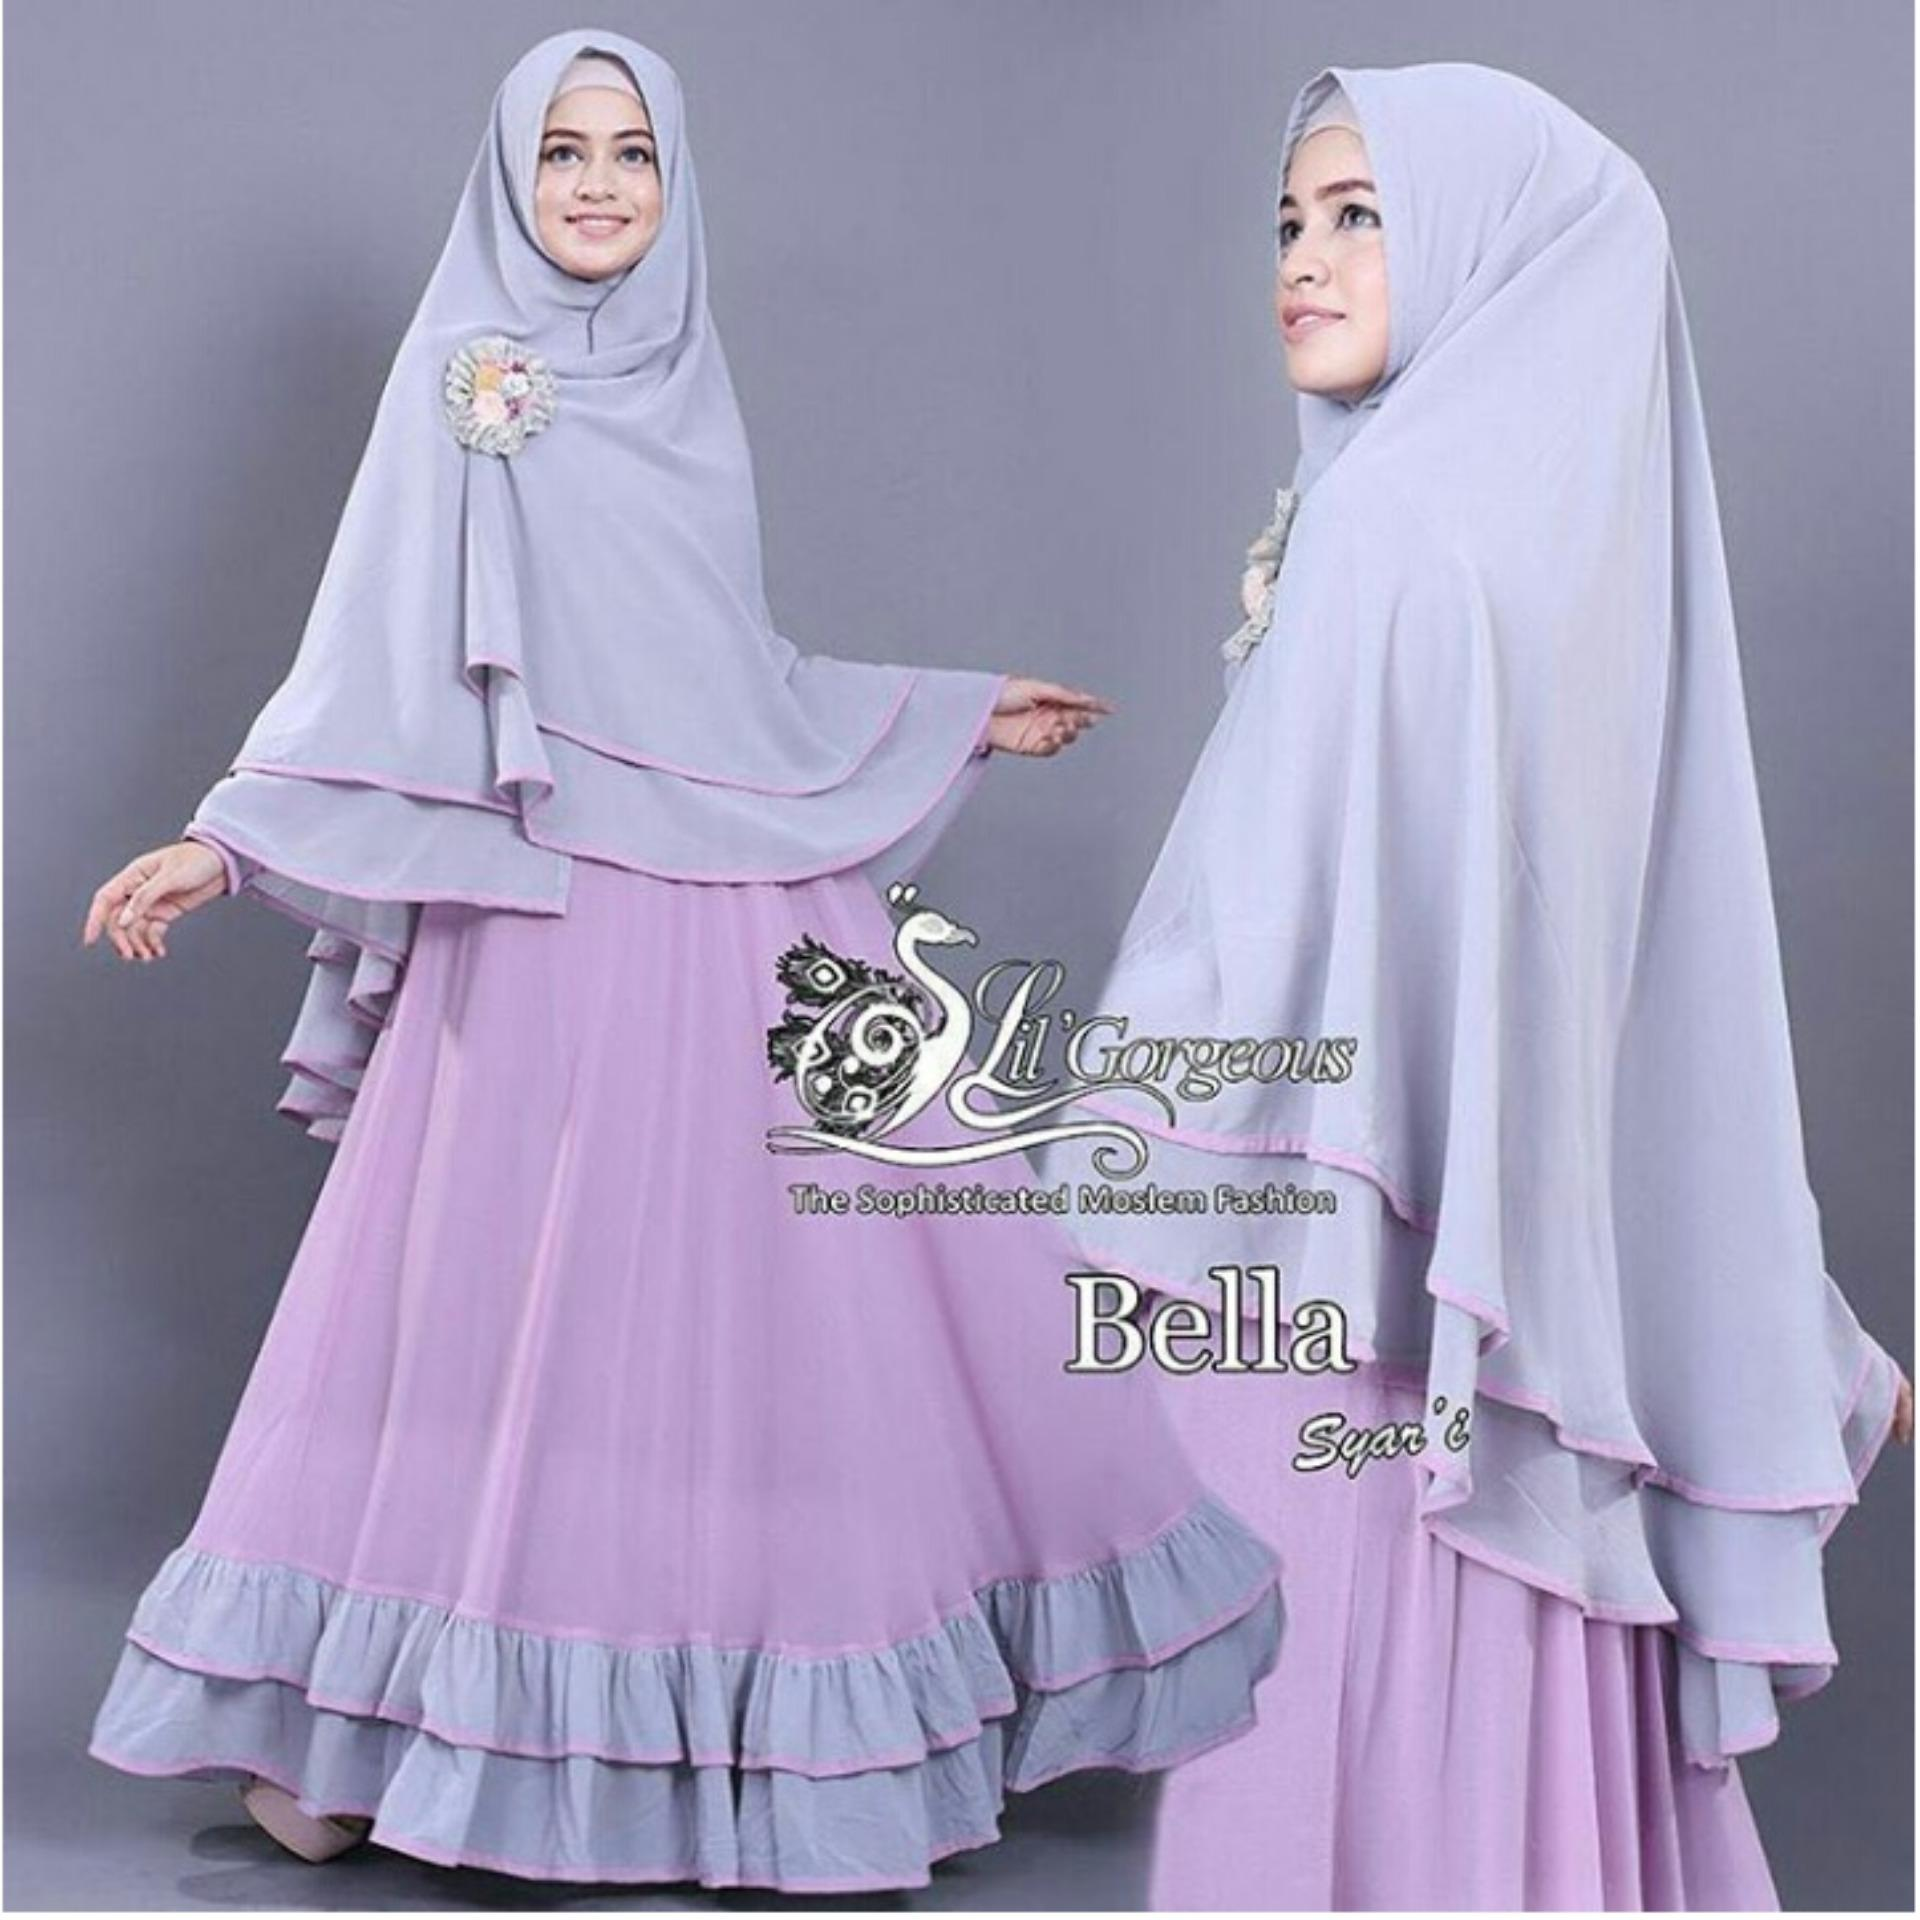 Baju Wanita Shop Baju Gamis Dress Muslim Syari Wanita EYYA Polos (LLABE) 1N - Lavender ( Dapat Jilbab ) / Hijab Muslimah / Baju Muslimah Wanita / Syari Syari'i Muslim / Gaun Muslim / Long Dress Muslimah Wanita